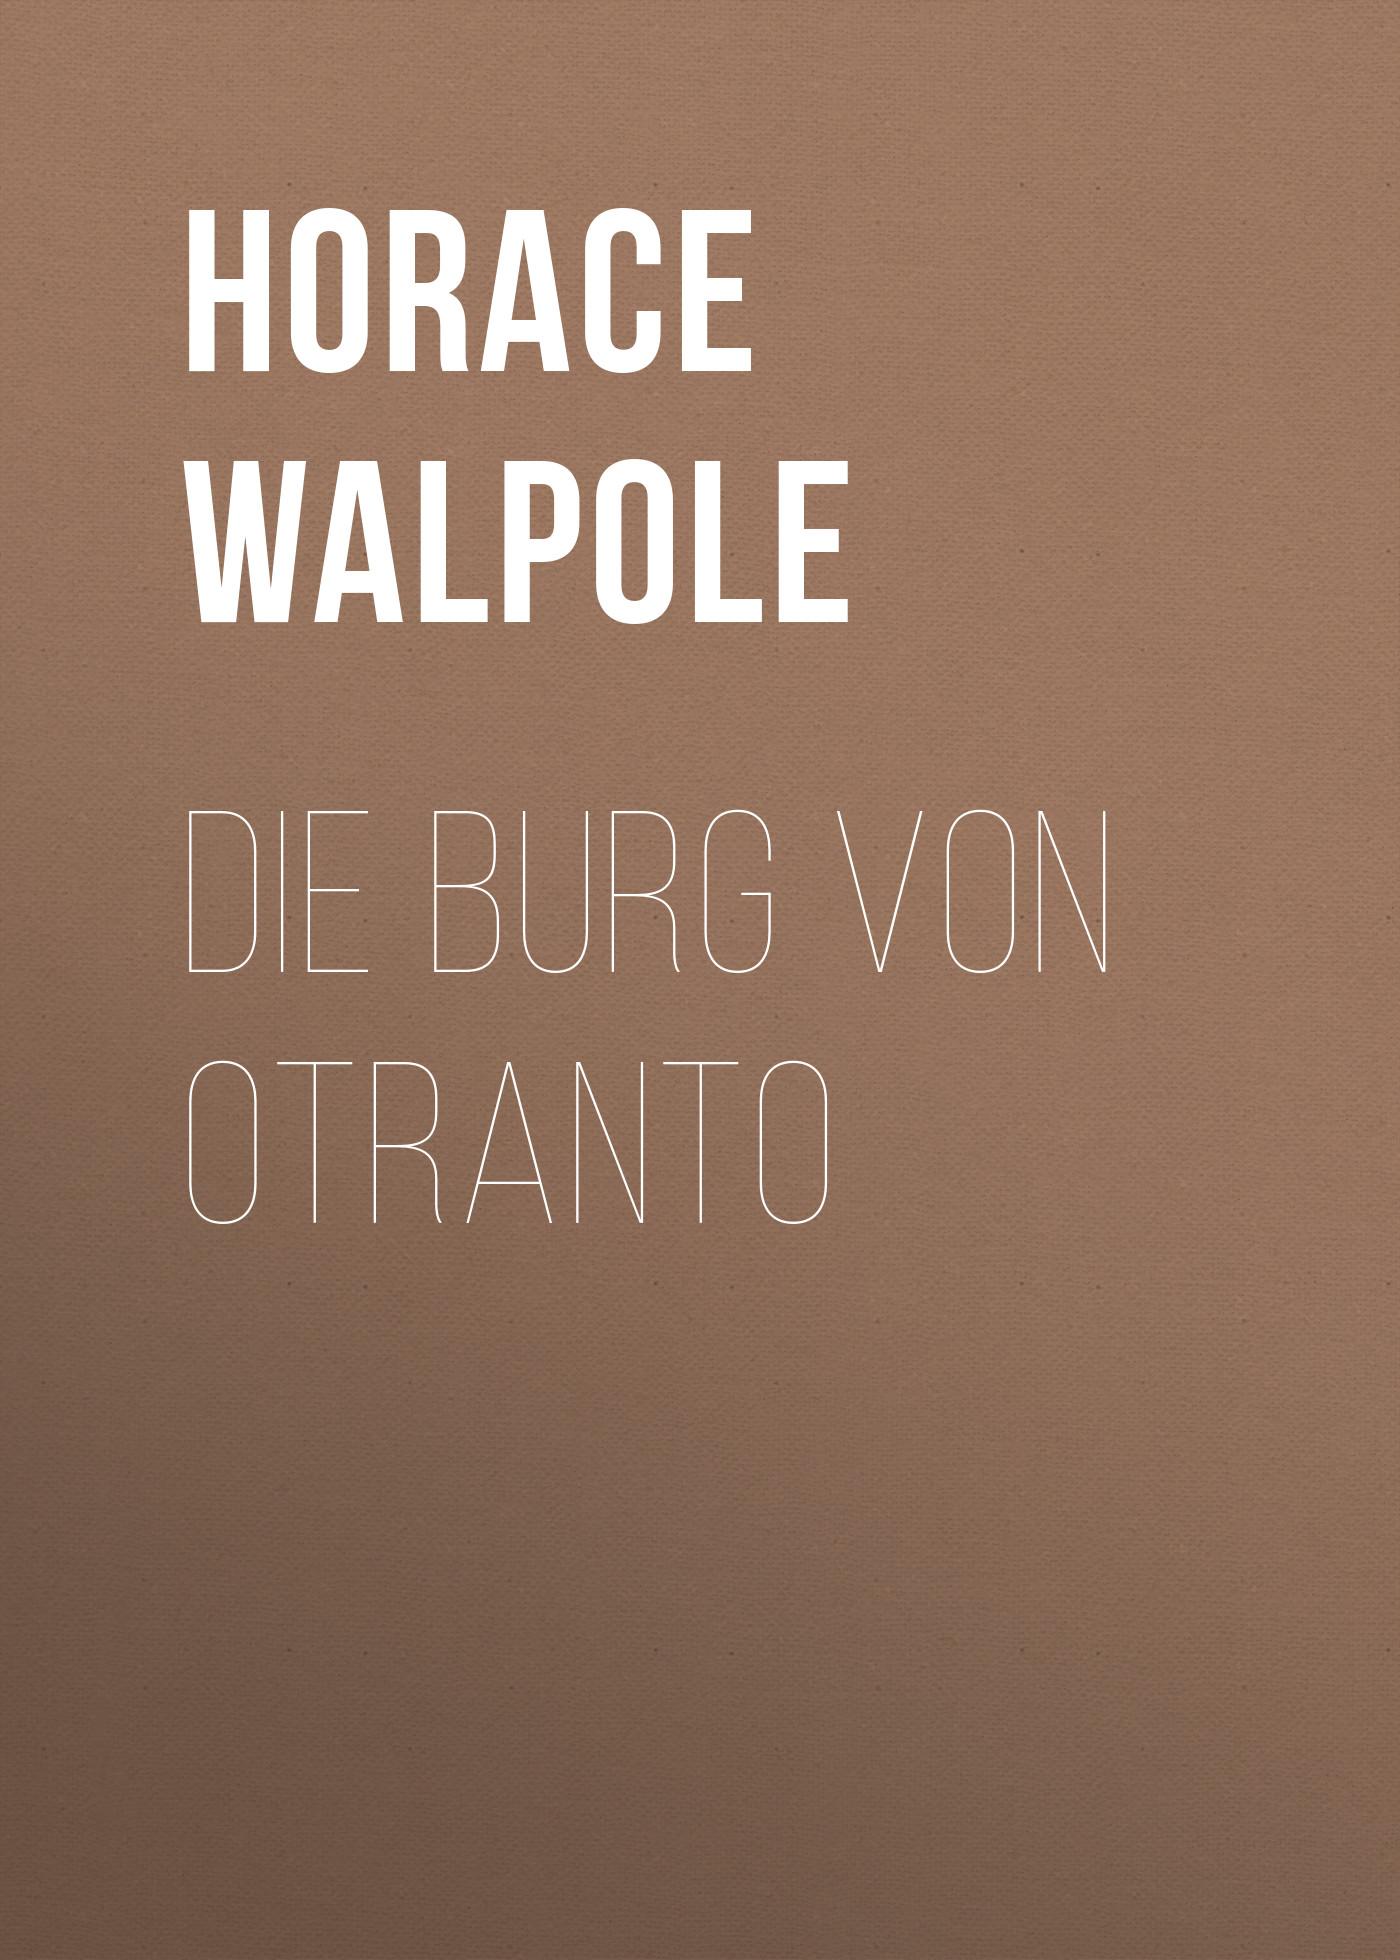 Horace Walpole Die Burg von Otranto horace walpole the letters of horace walpole fourth earl of orford volume 8